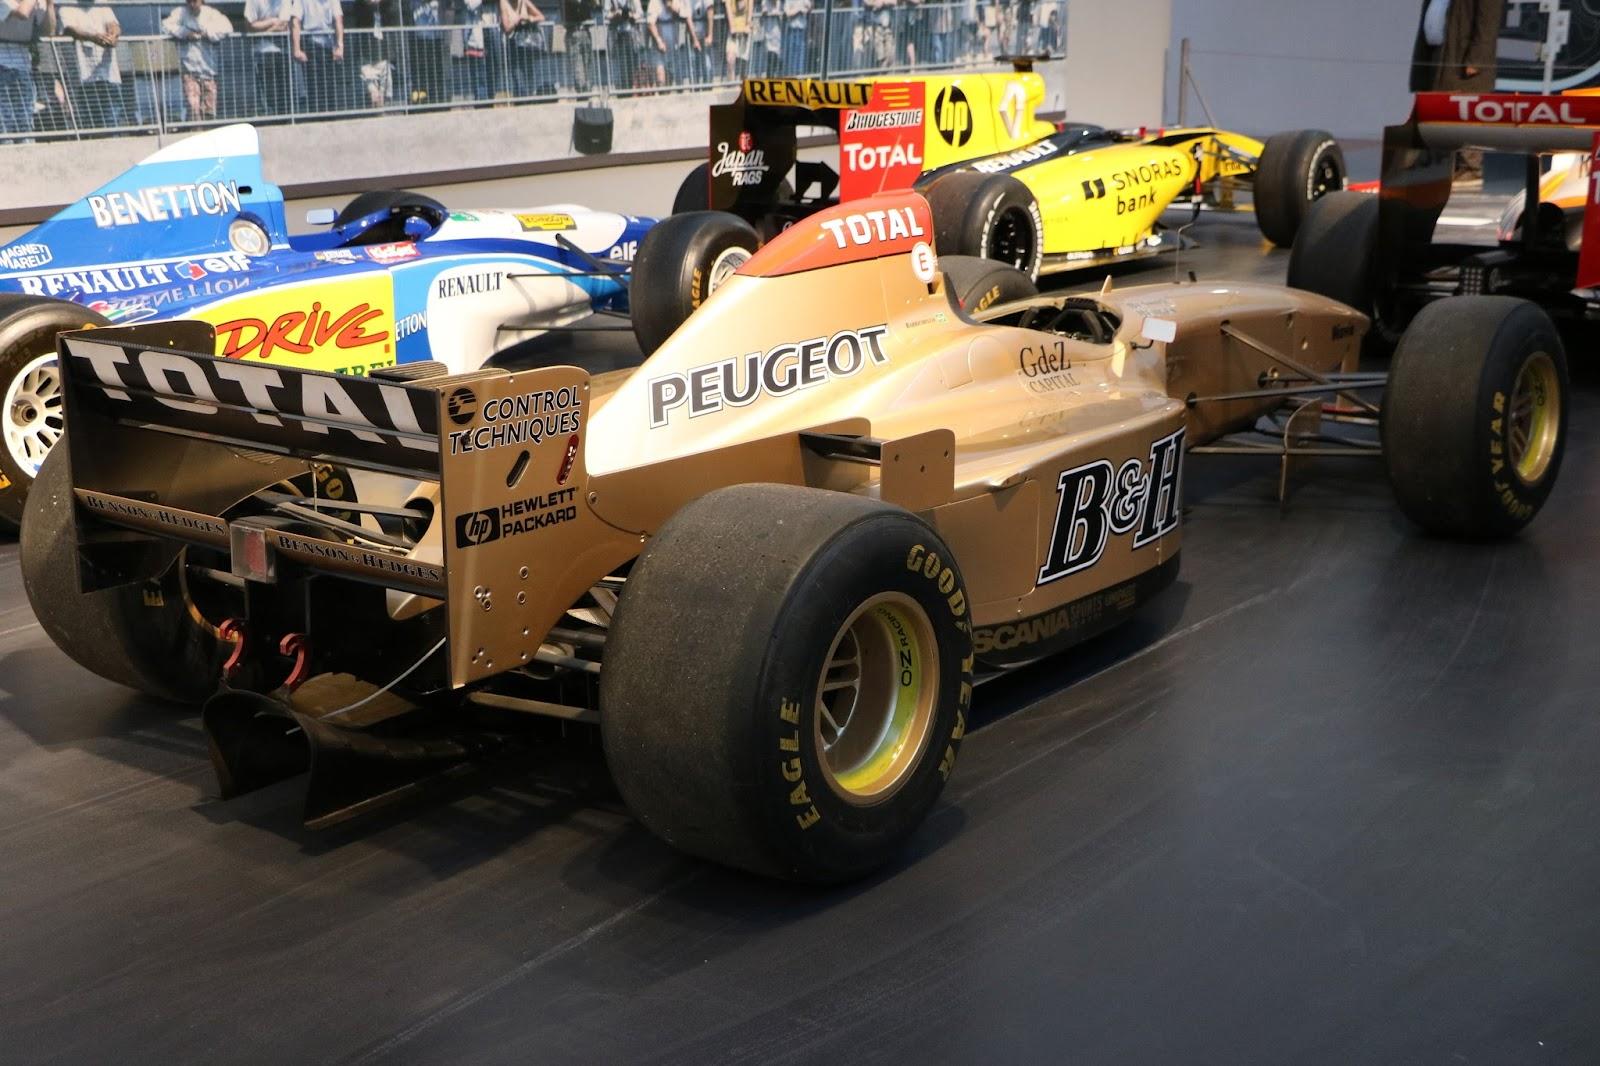 Schlumpf Collection 1206 - 1995 Jordan-Peugeot F1 195.jpg